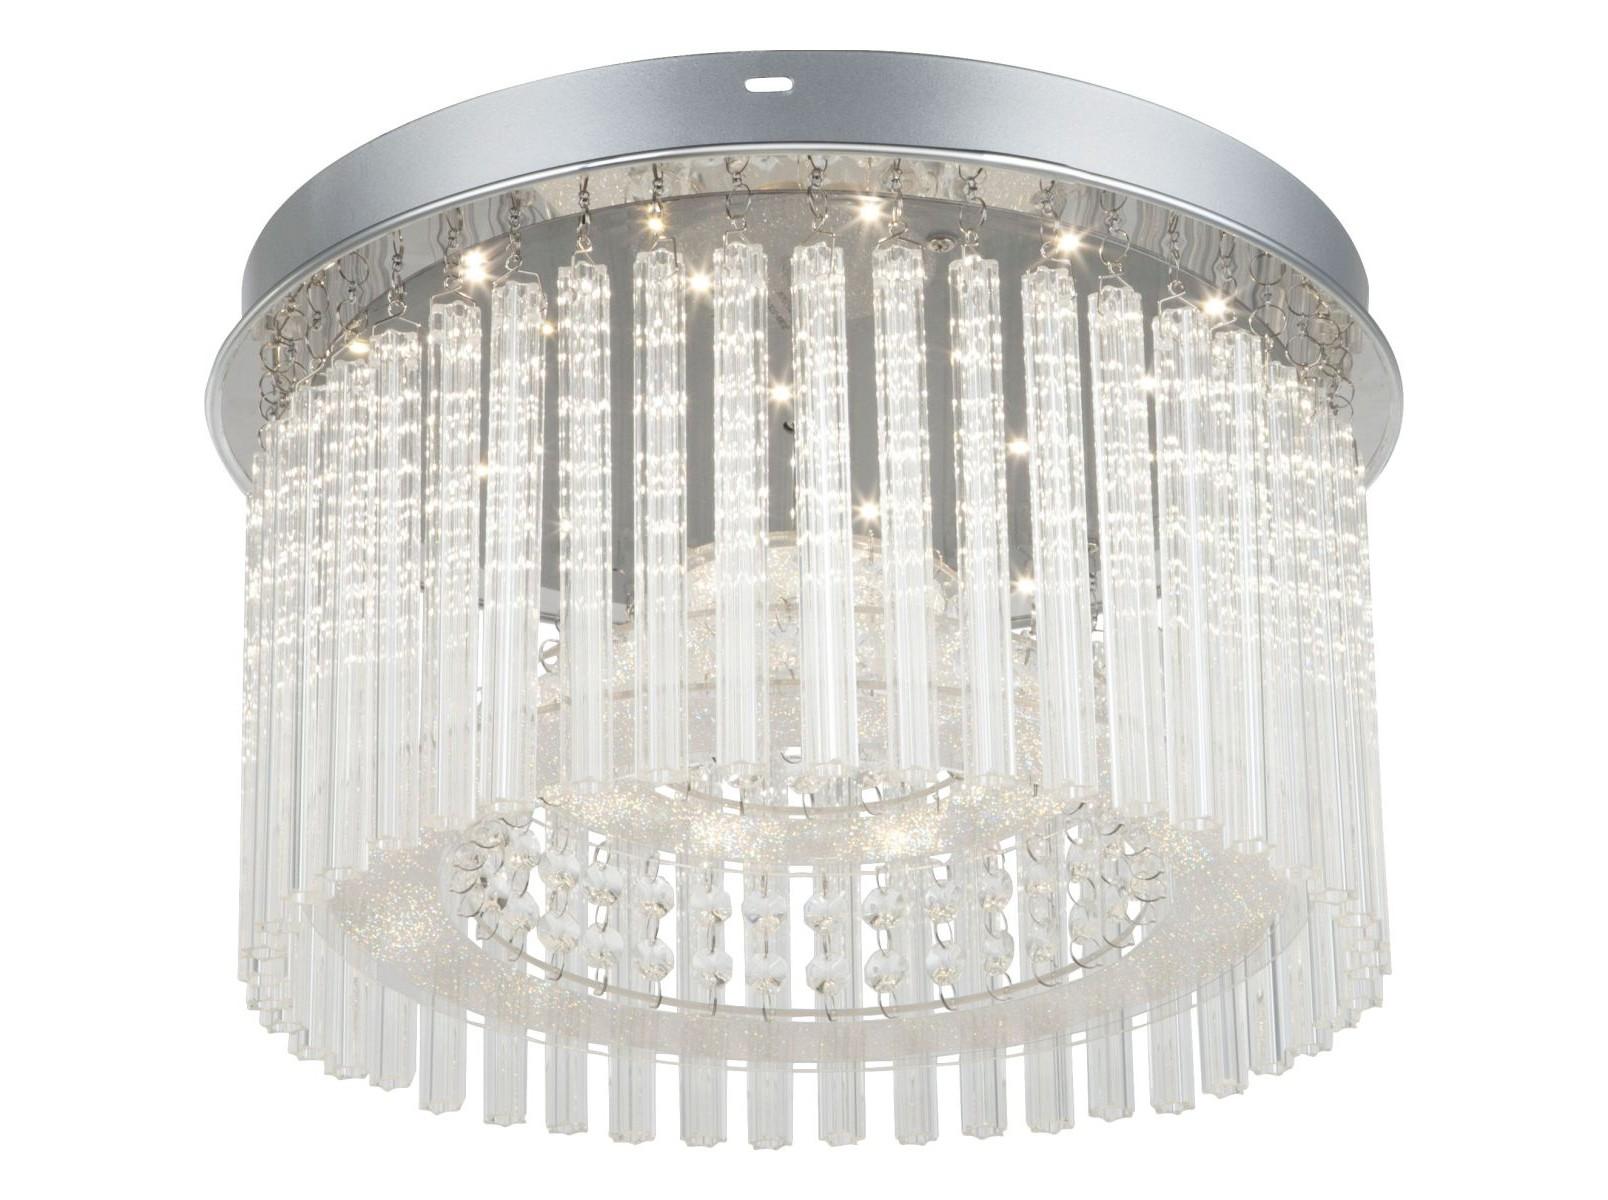 Светильник потолочныйПотолочные светильники<br>&amp;lt;div&amp;gt;Вид цоколя: LED&amp;lt;/div&amp;gt;&amp;lt;div&amp;gt;Мощность ламп: 18W&amp;lt;/div&amp;gt;&amp;lt;div&amp;gt;Количество ламп: 1&amp;lt;/div&amp;gt;&amp;lt;div&amp;gt;Наличие ламп: да&amp;lt;/div&amp;gt;<br><br>Material: Стекло<br>Высота см: 37